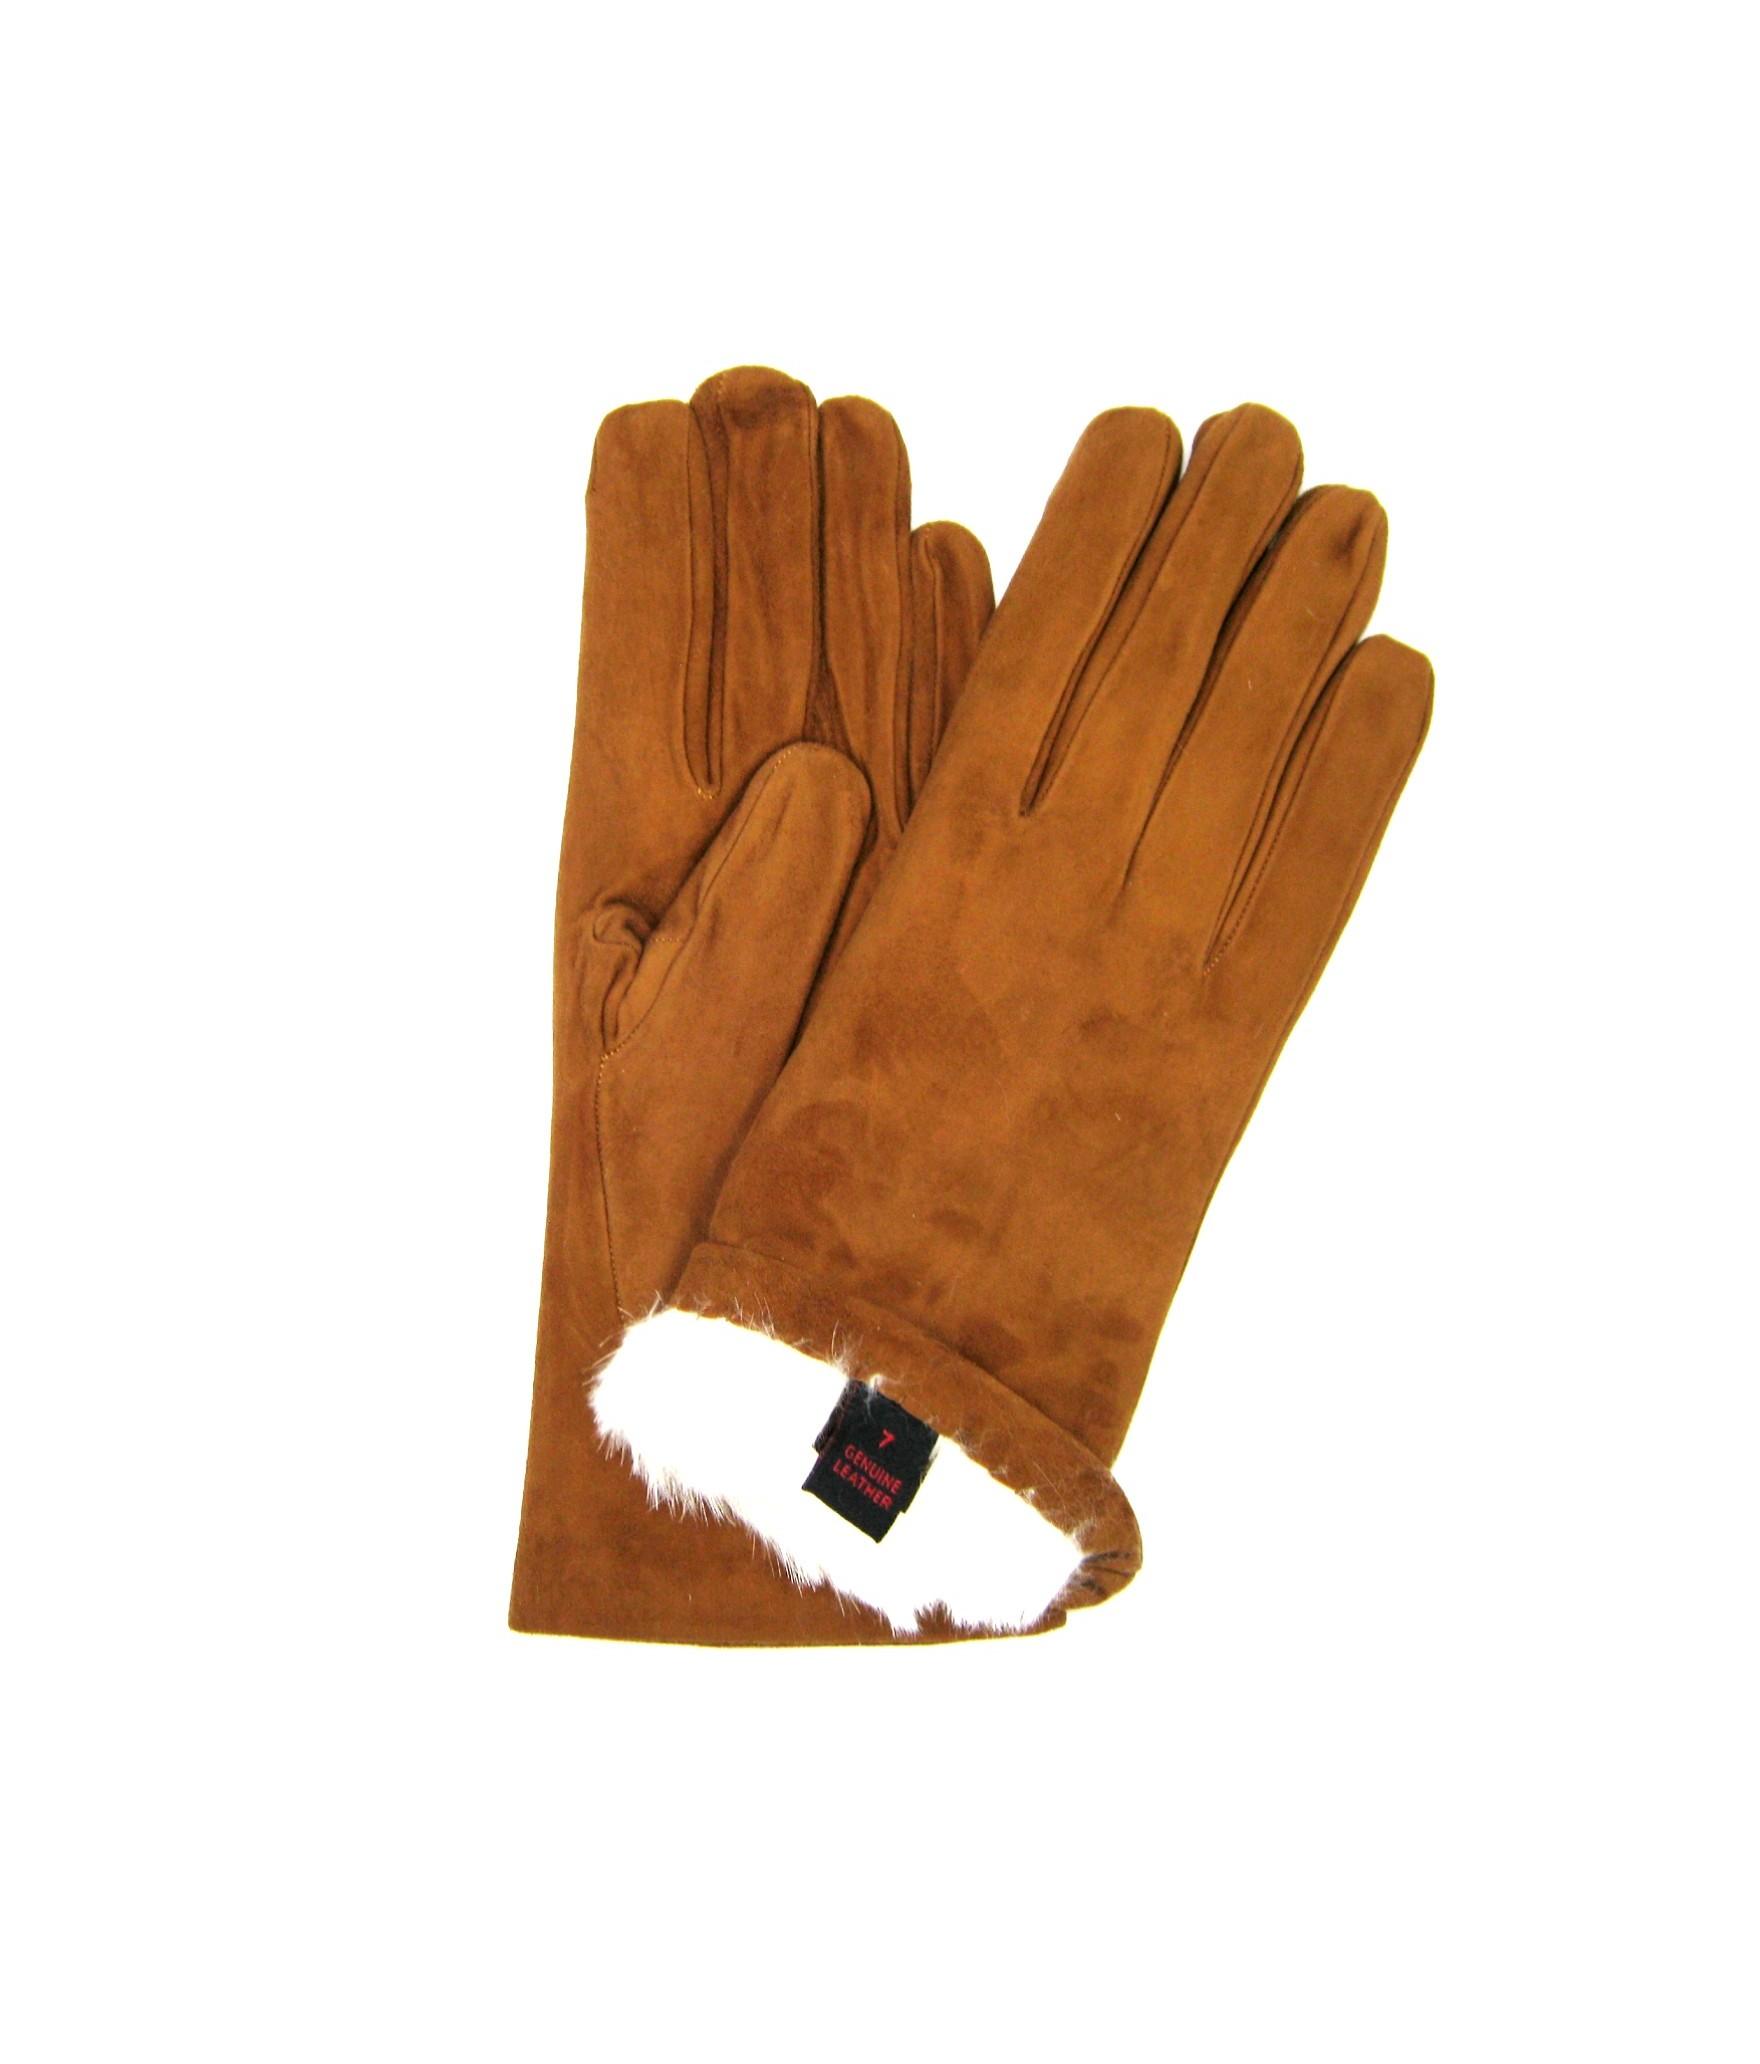 Suede Nappa leather gloves 2bt Rabbit fur lined Tan Sermoneta